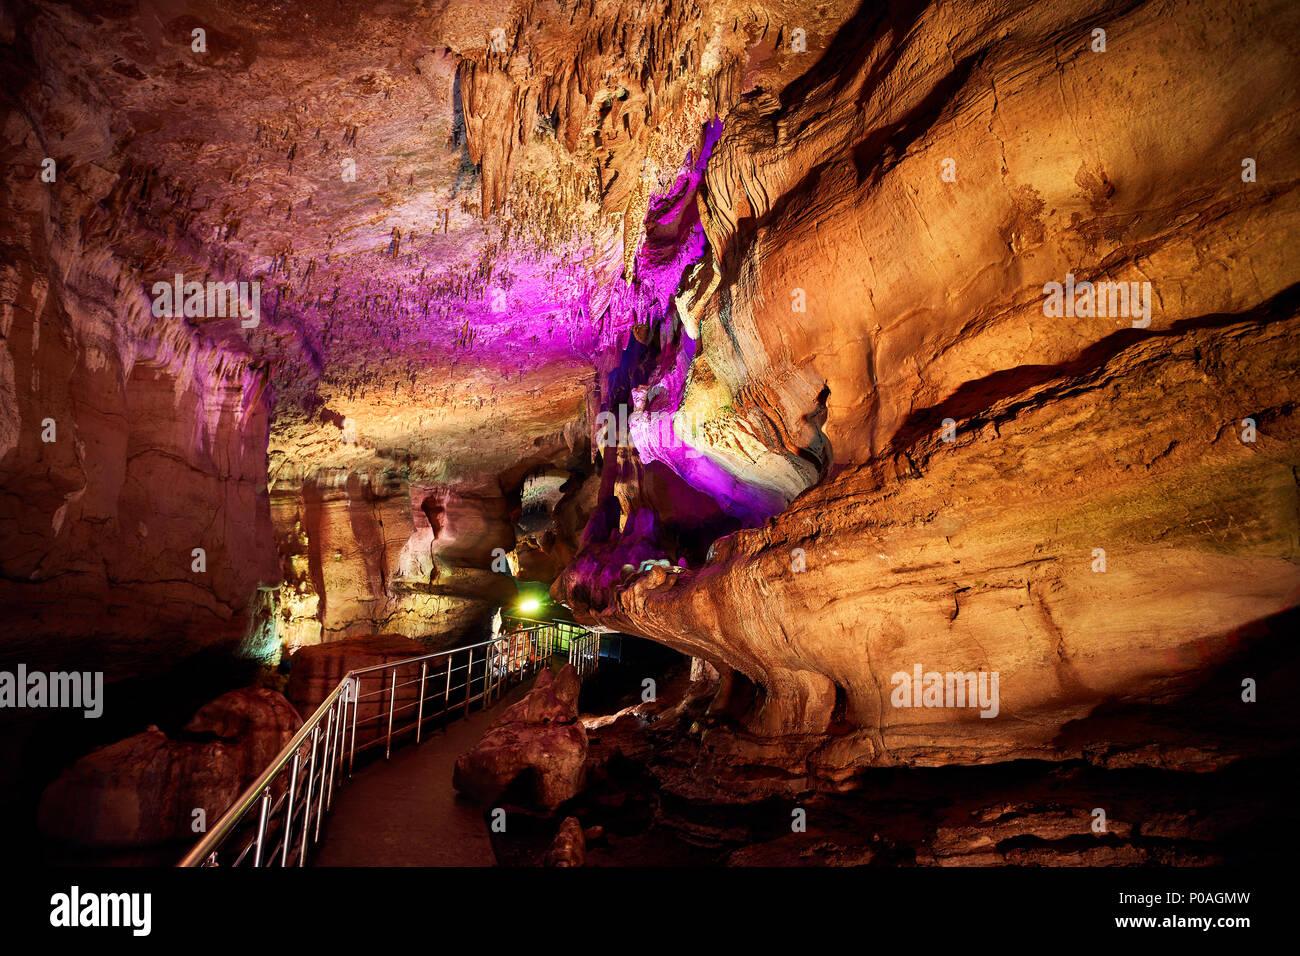 Unterirdische Höhle Sataplia mit bunten Beleuchtung in Kutaissi, Georgien Stockbild